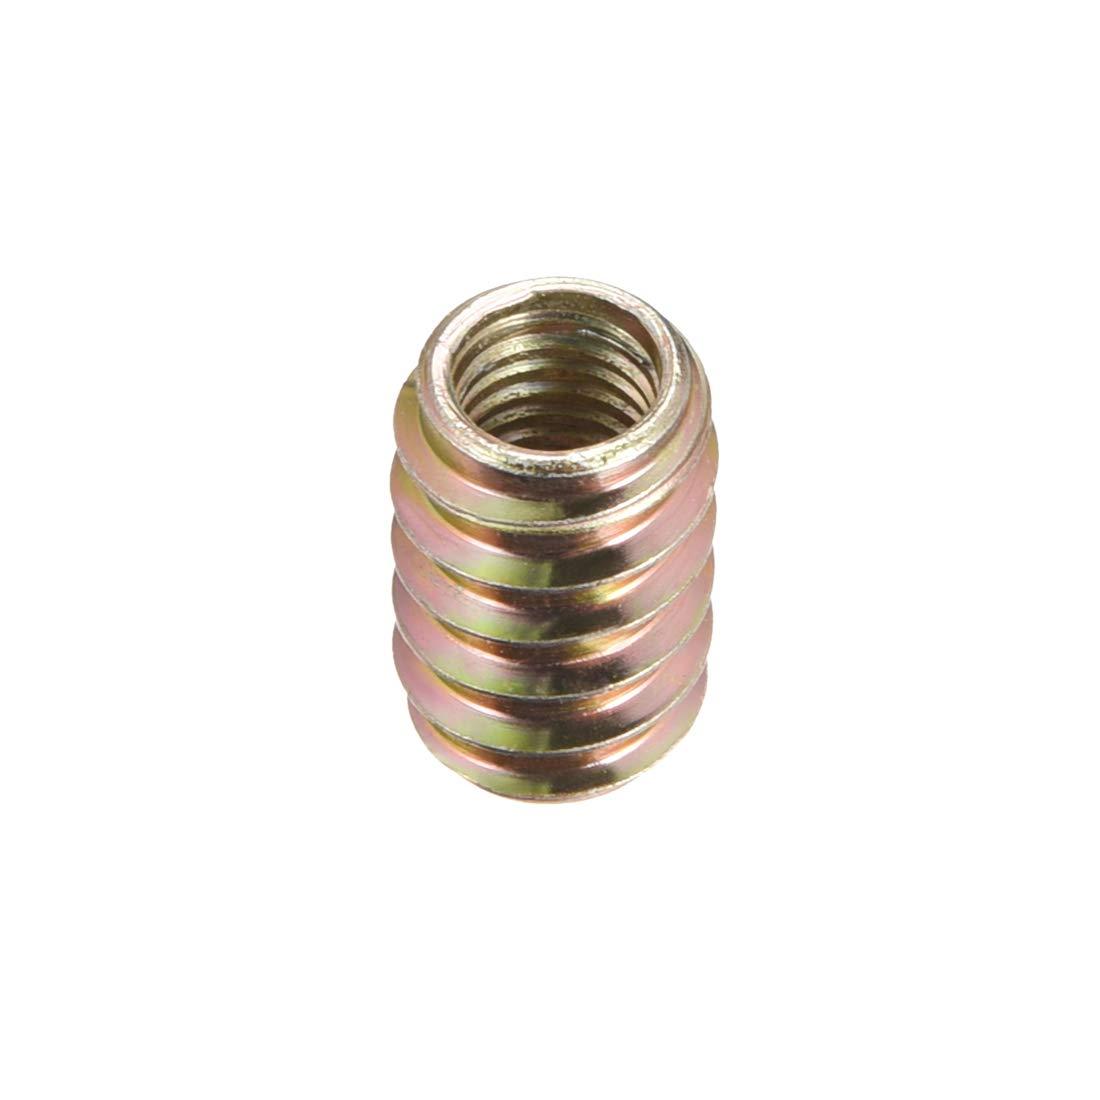 uxcell Furniture Threaded Insert Nut Carbon Steel M8 Internal Thread 20mm Length 50pcs